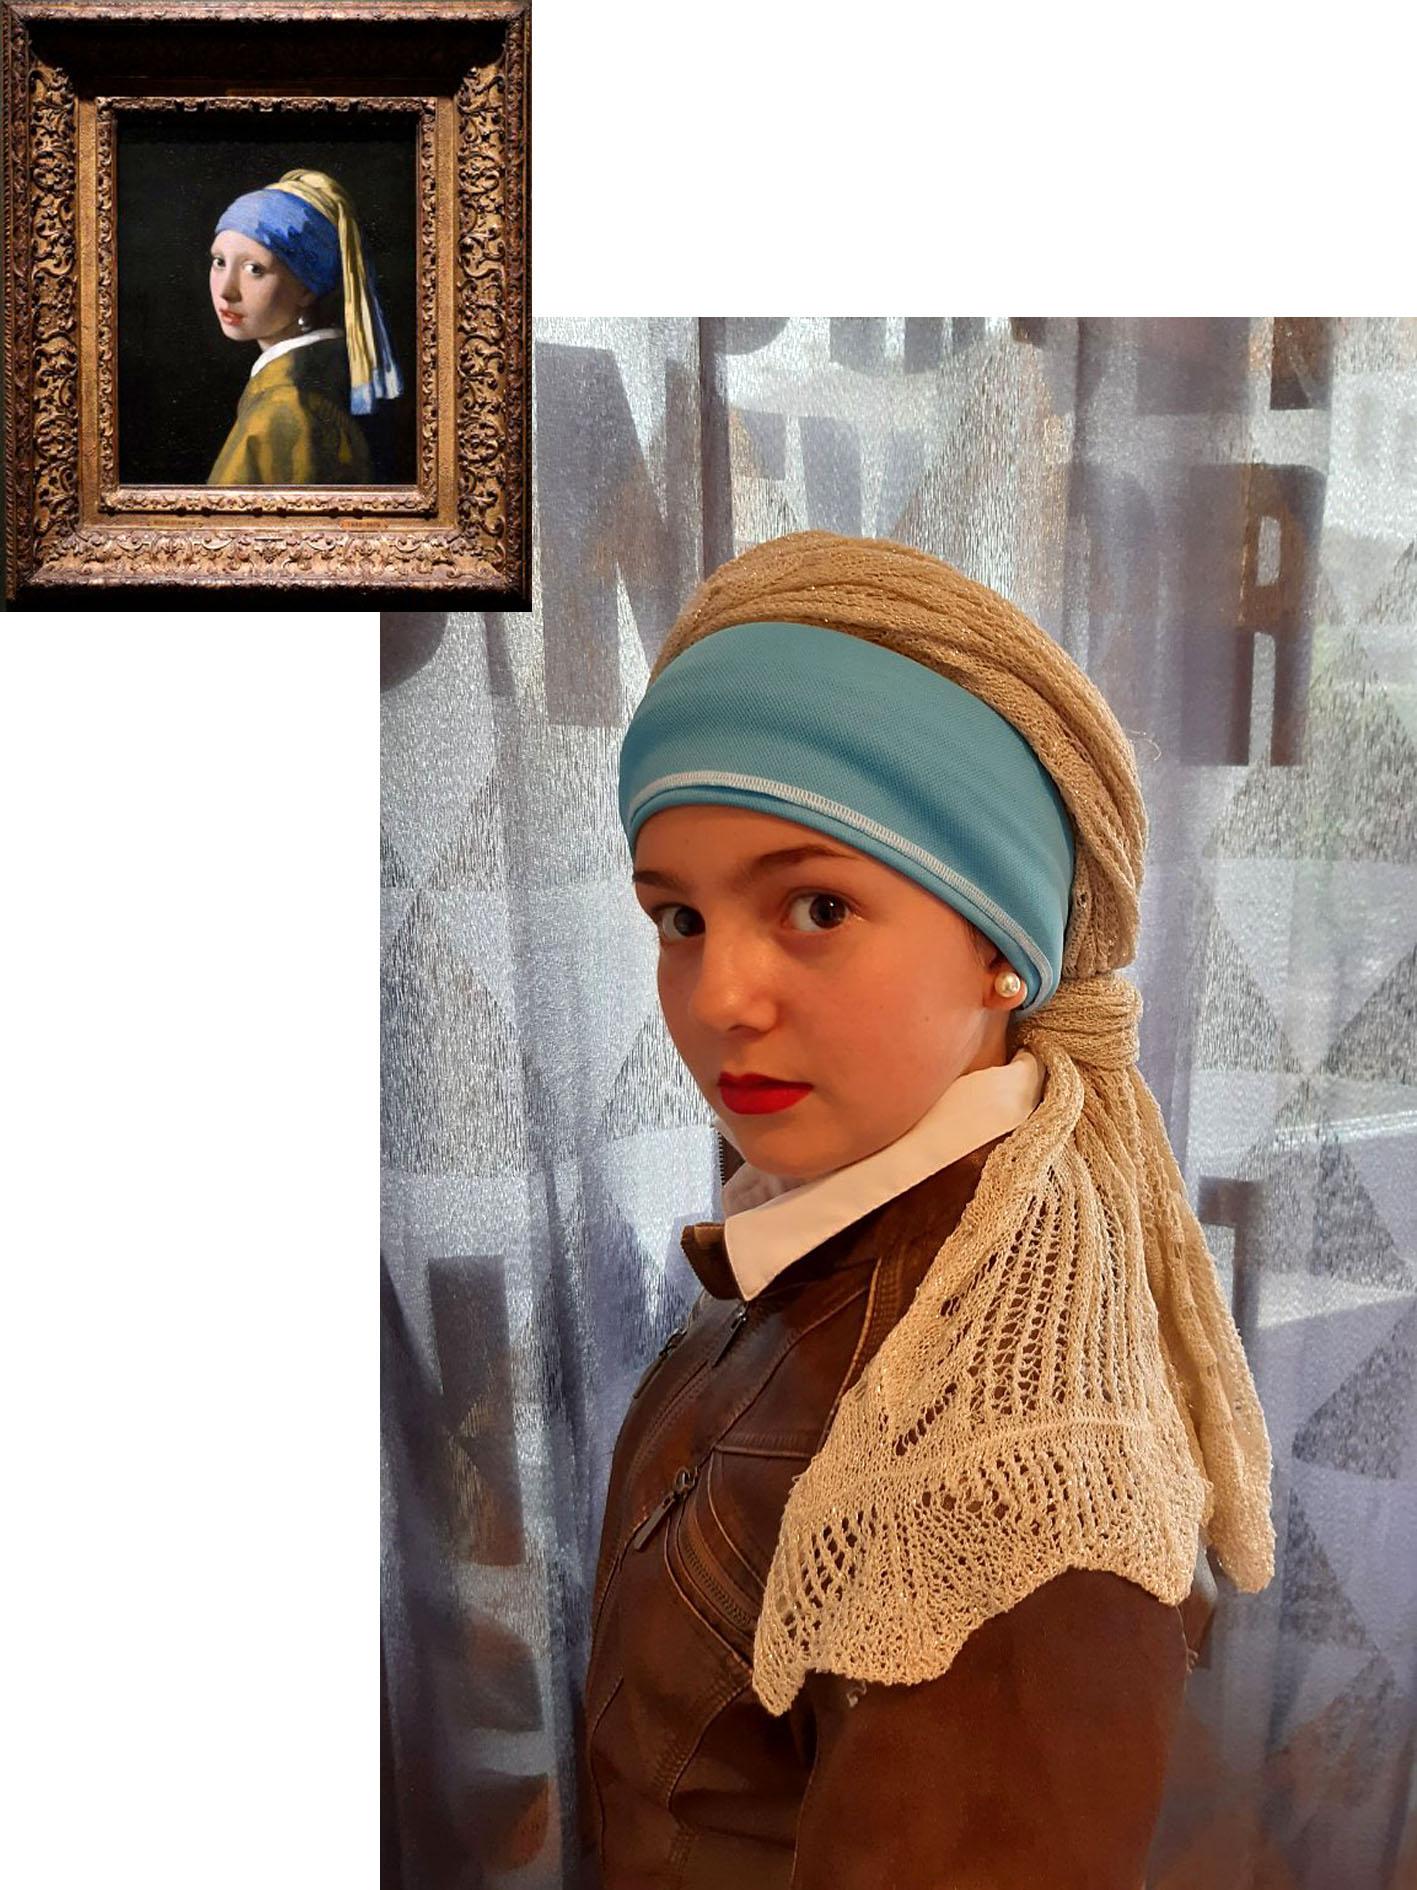 Jana Piovesan (1A) - Das Mädchen mit dem Perlohrring (Johannes Vermeer)